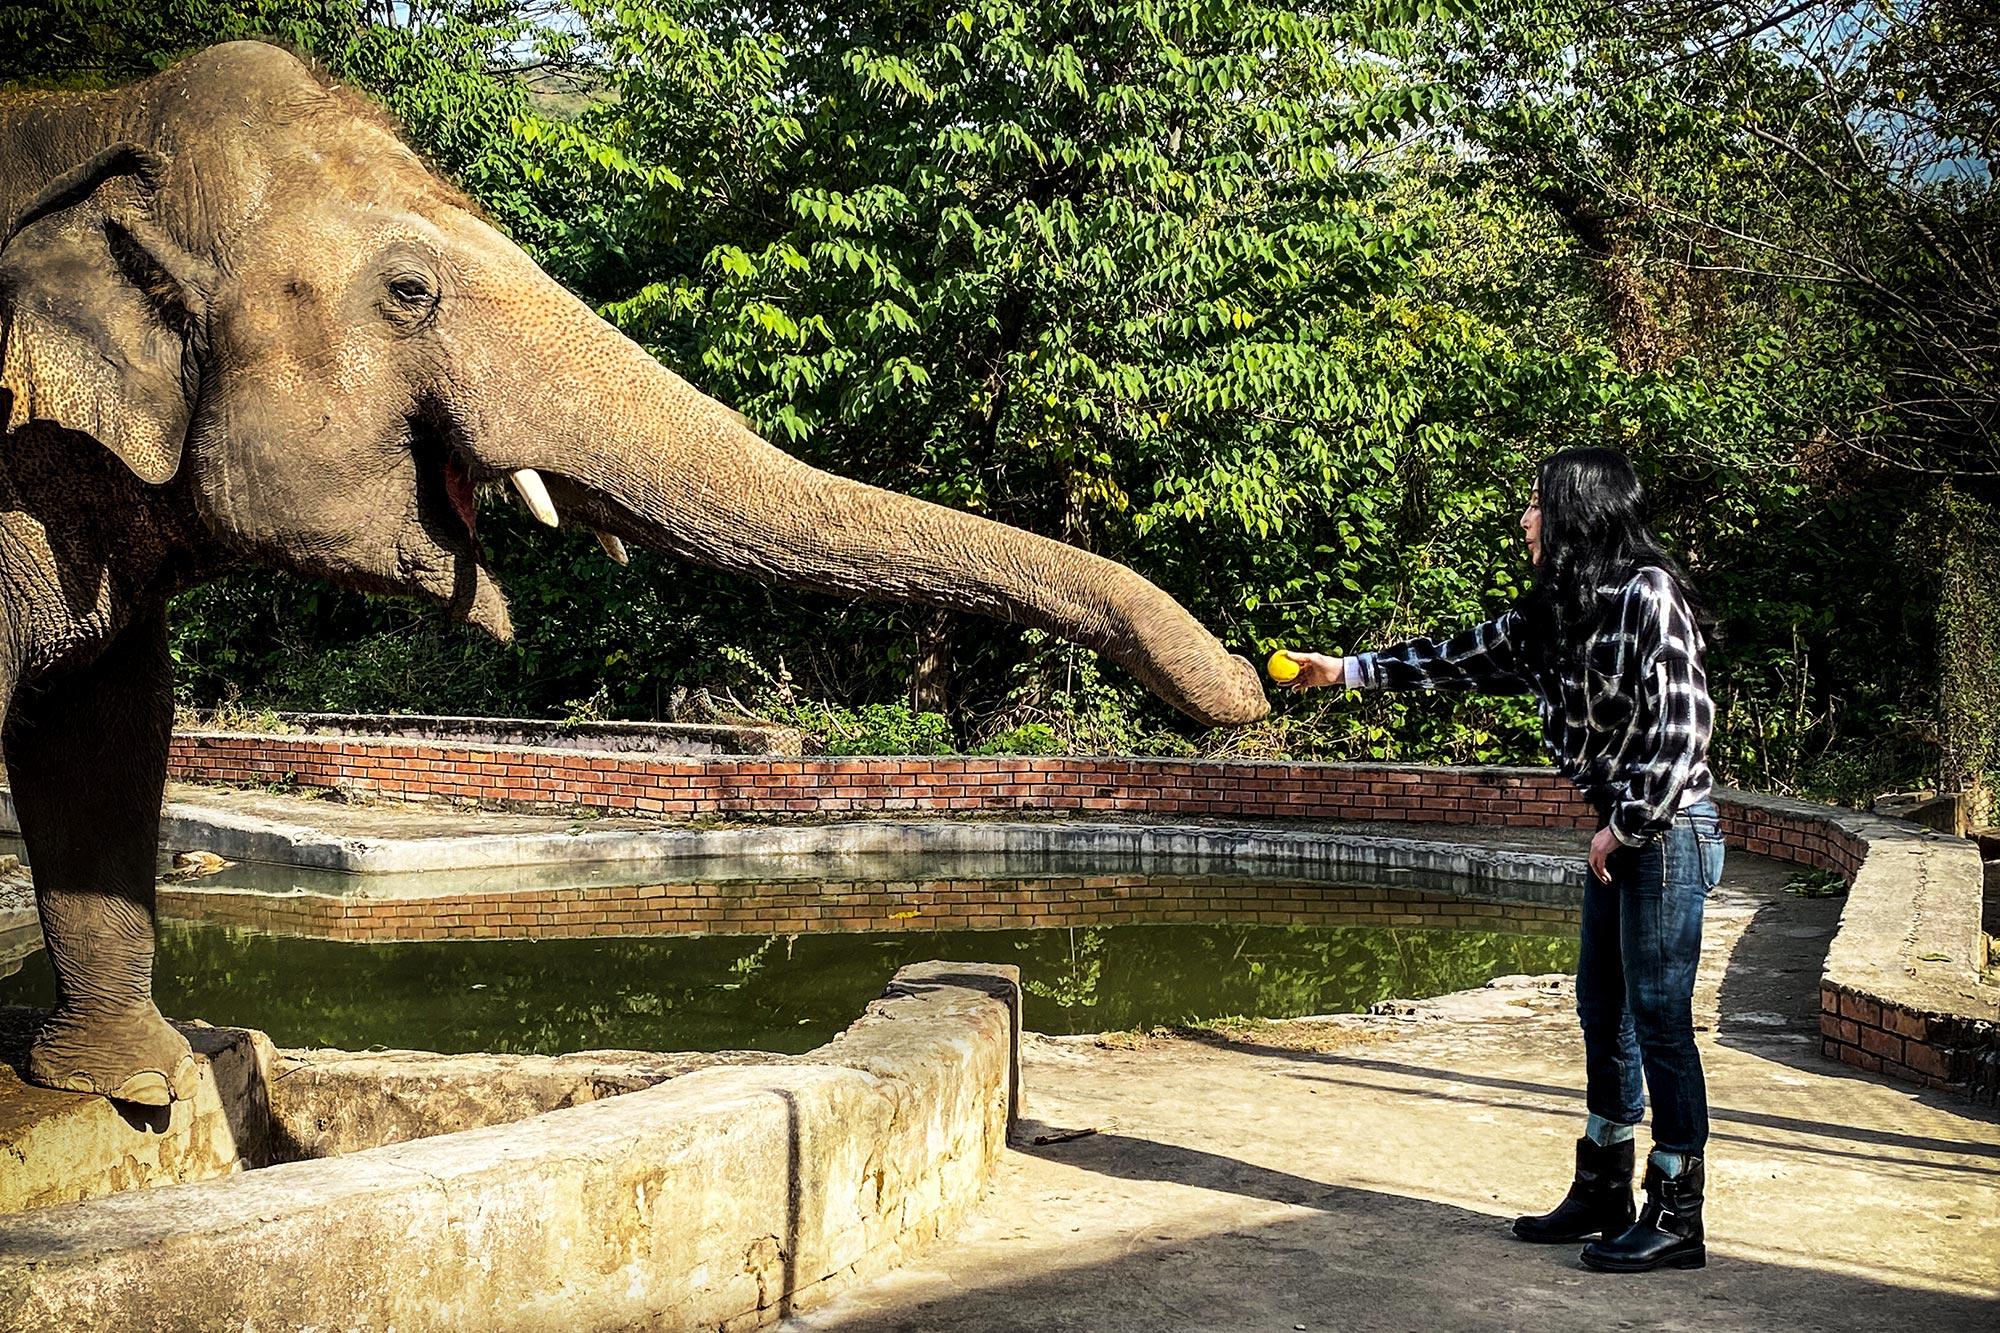 Free the Wild elephant documentary